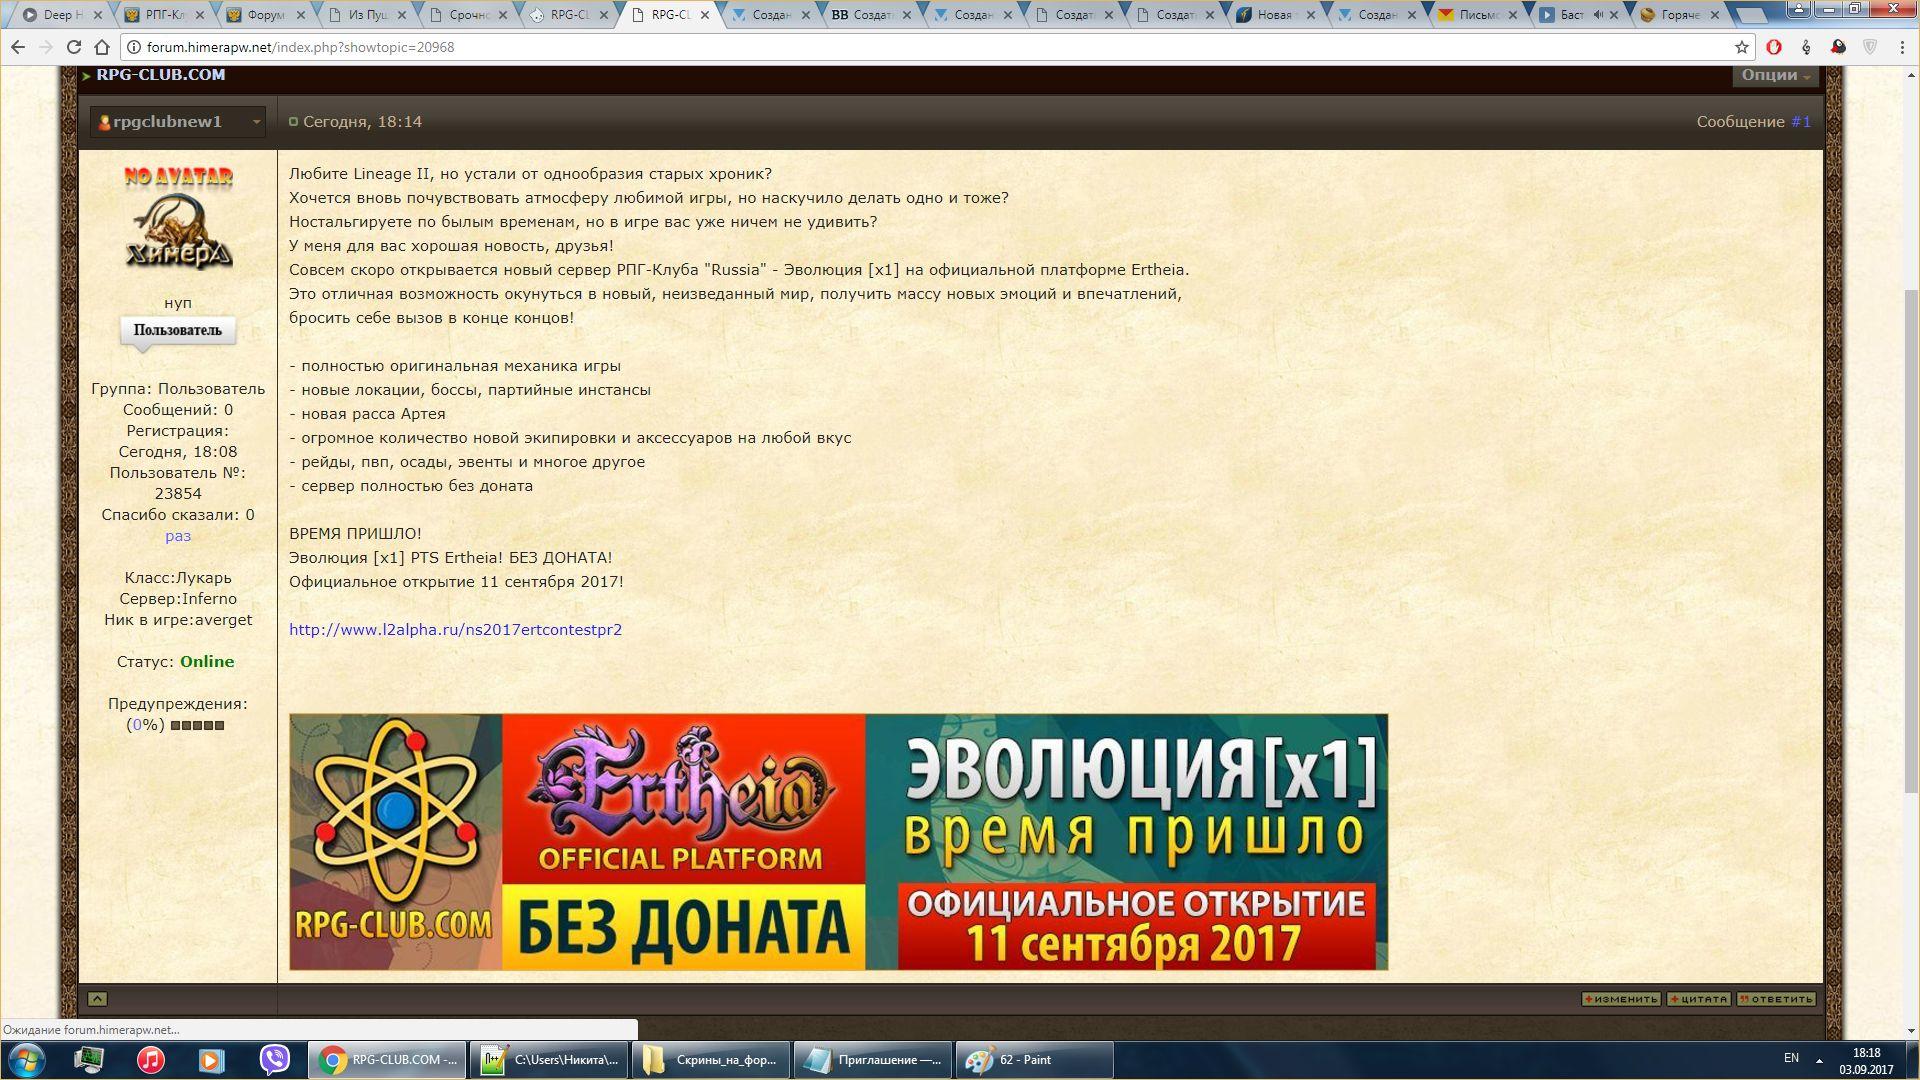 Lineage 2 Screenshot: Хроники серверов Lineage2 L2